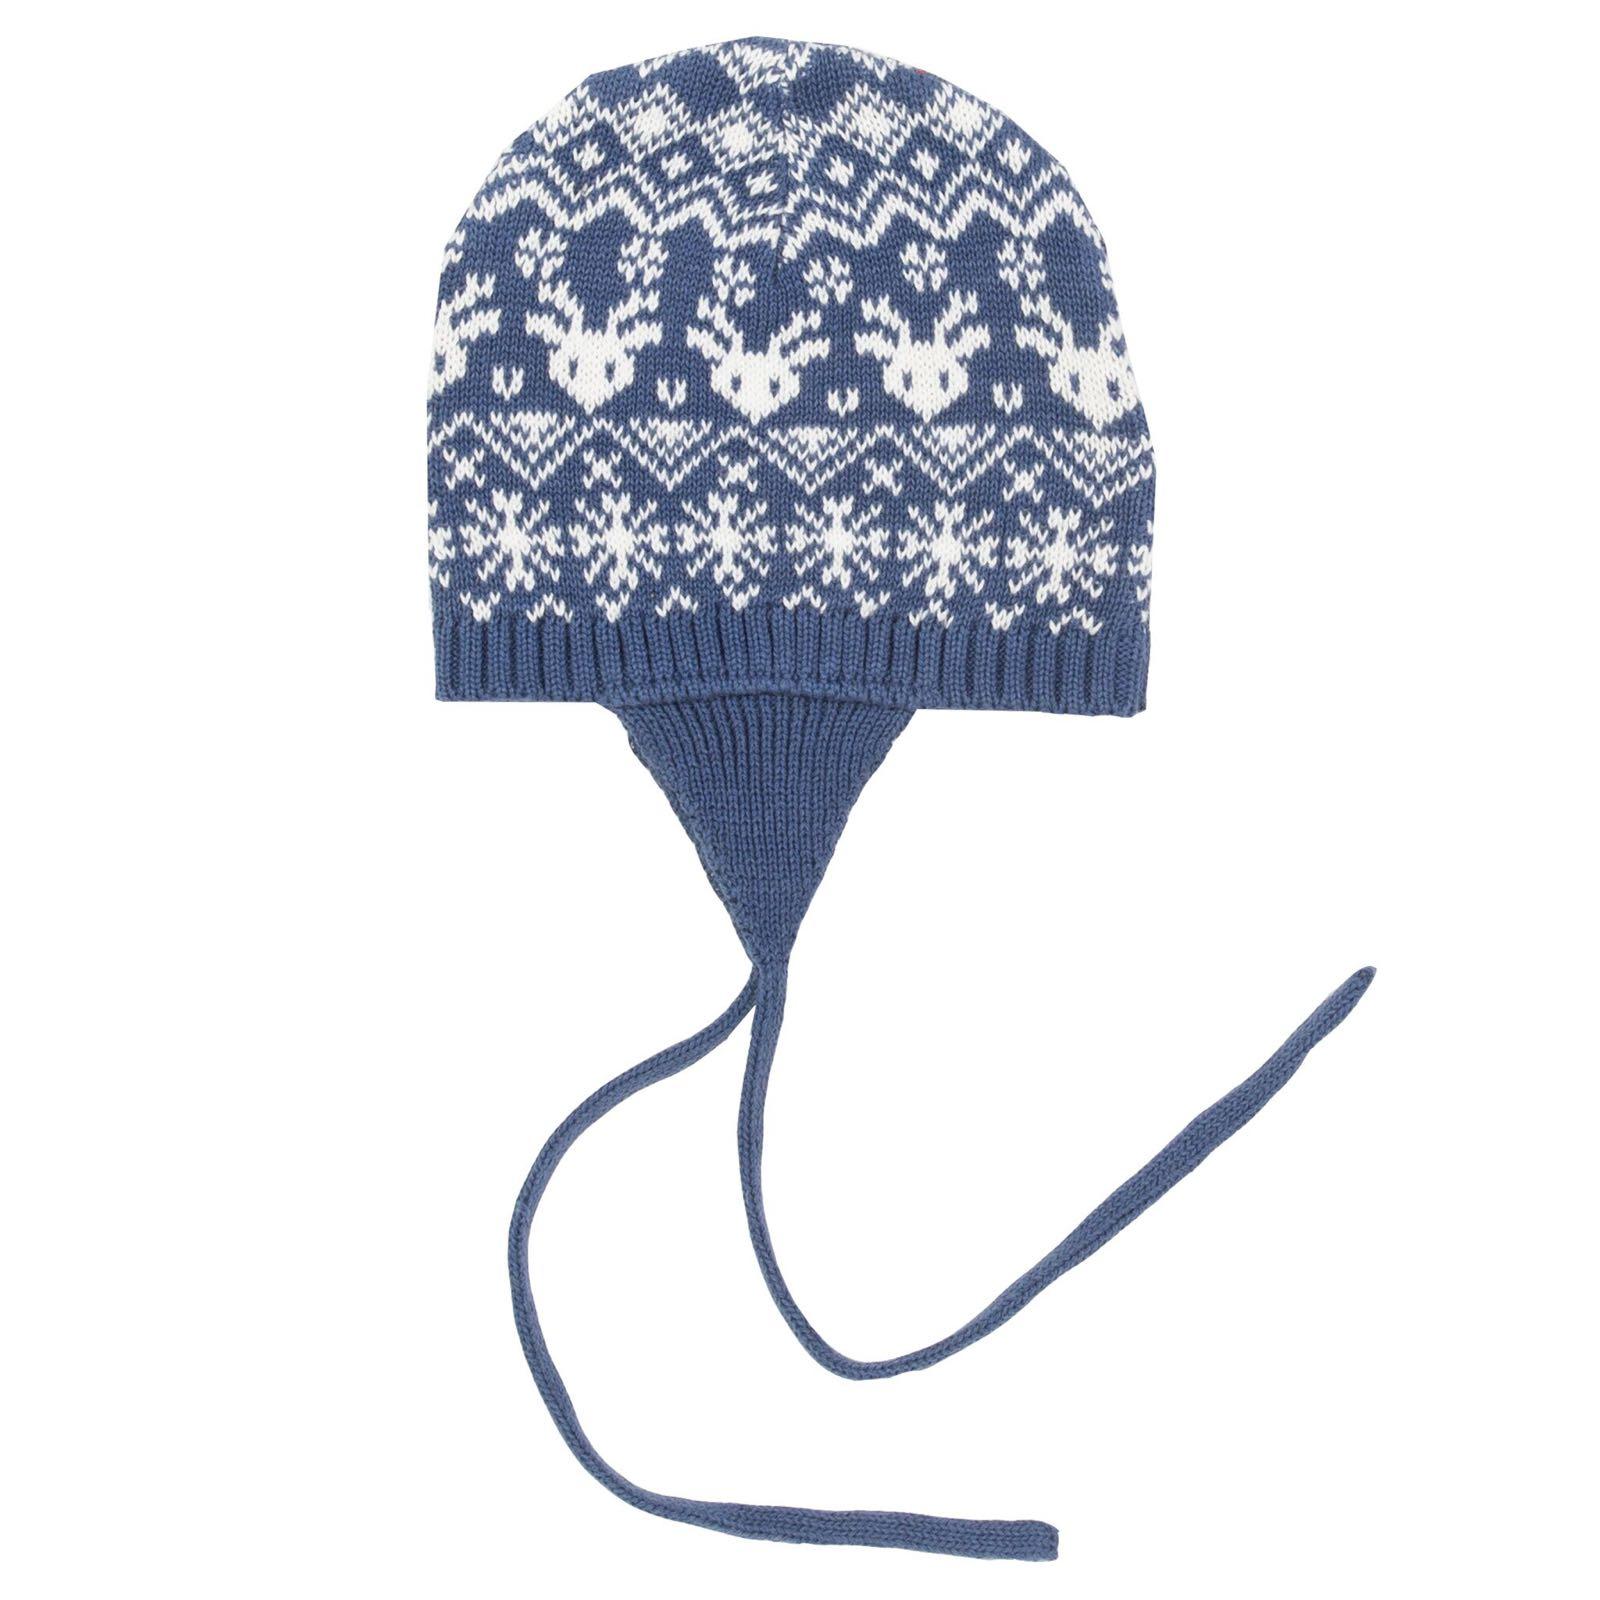 Kite Nordic Hat, Blue